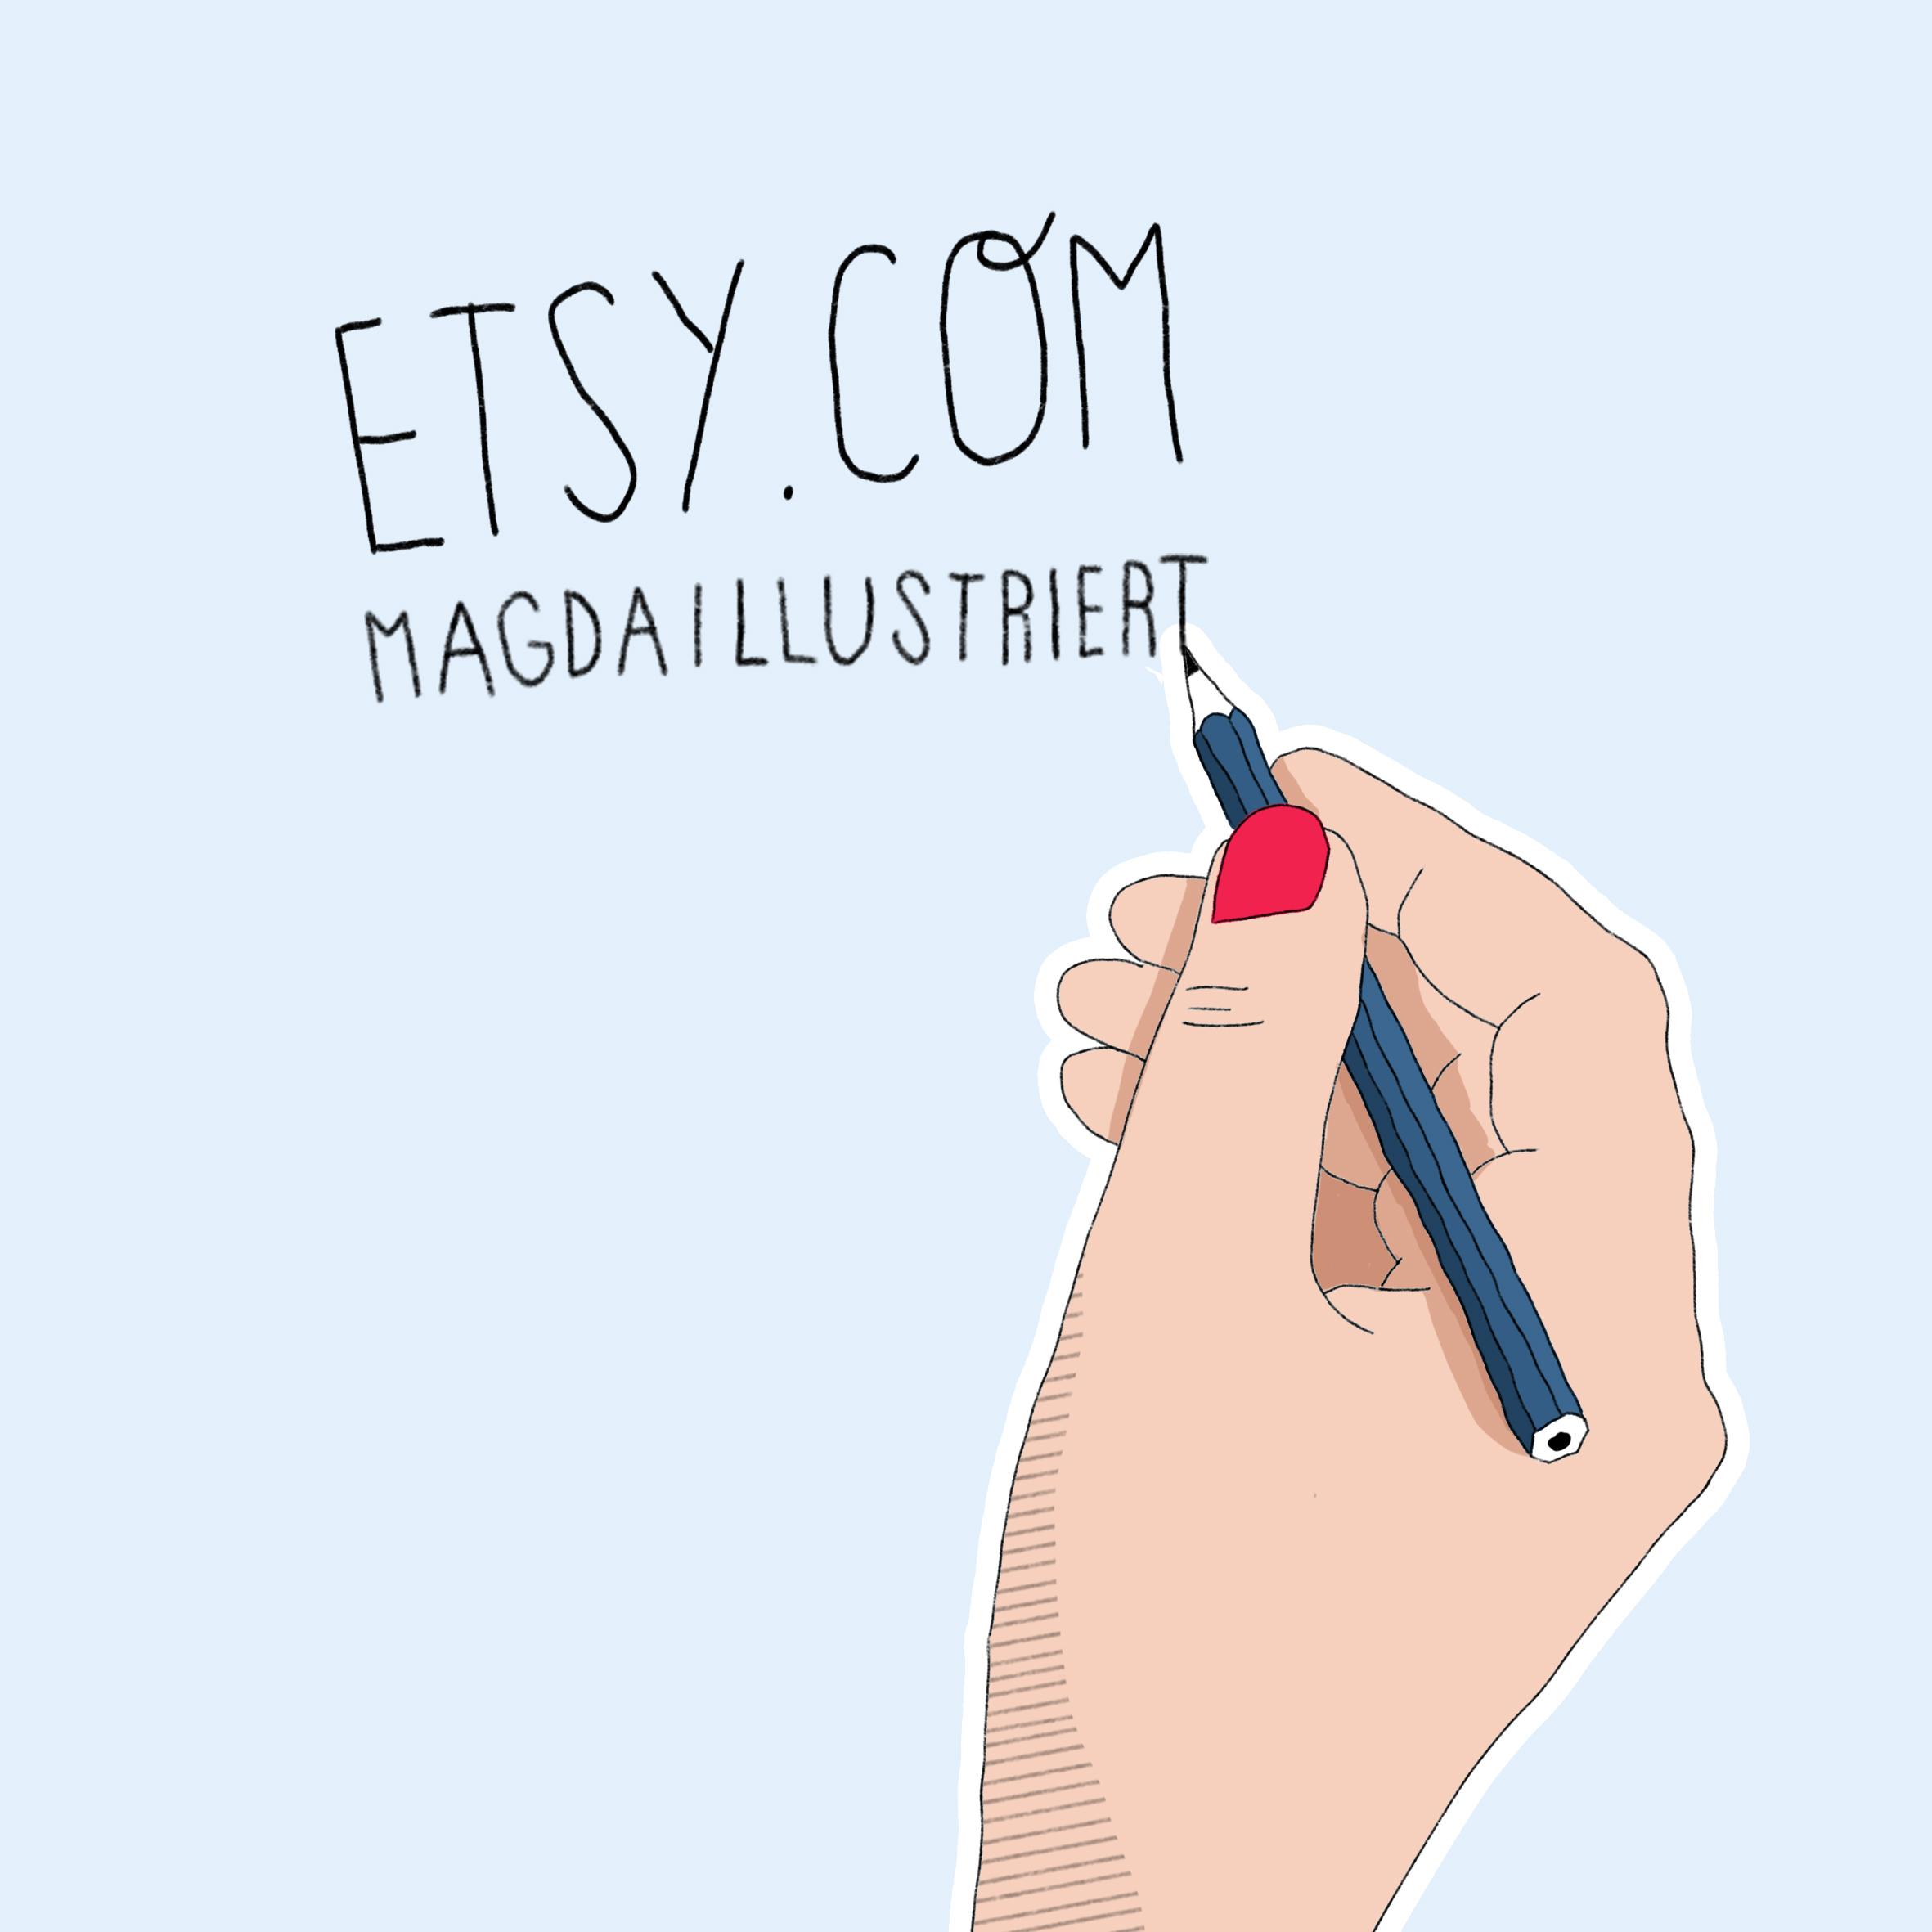 etsy+hand